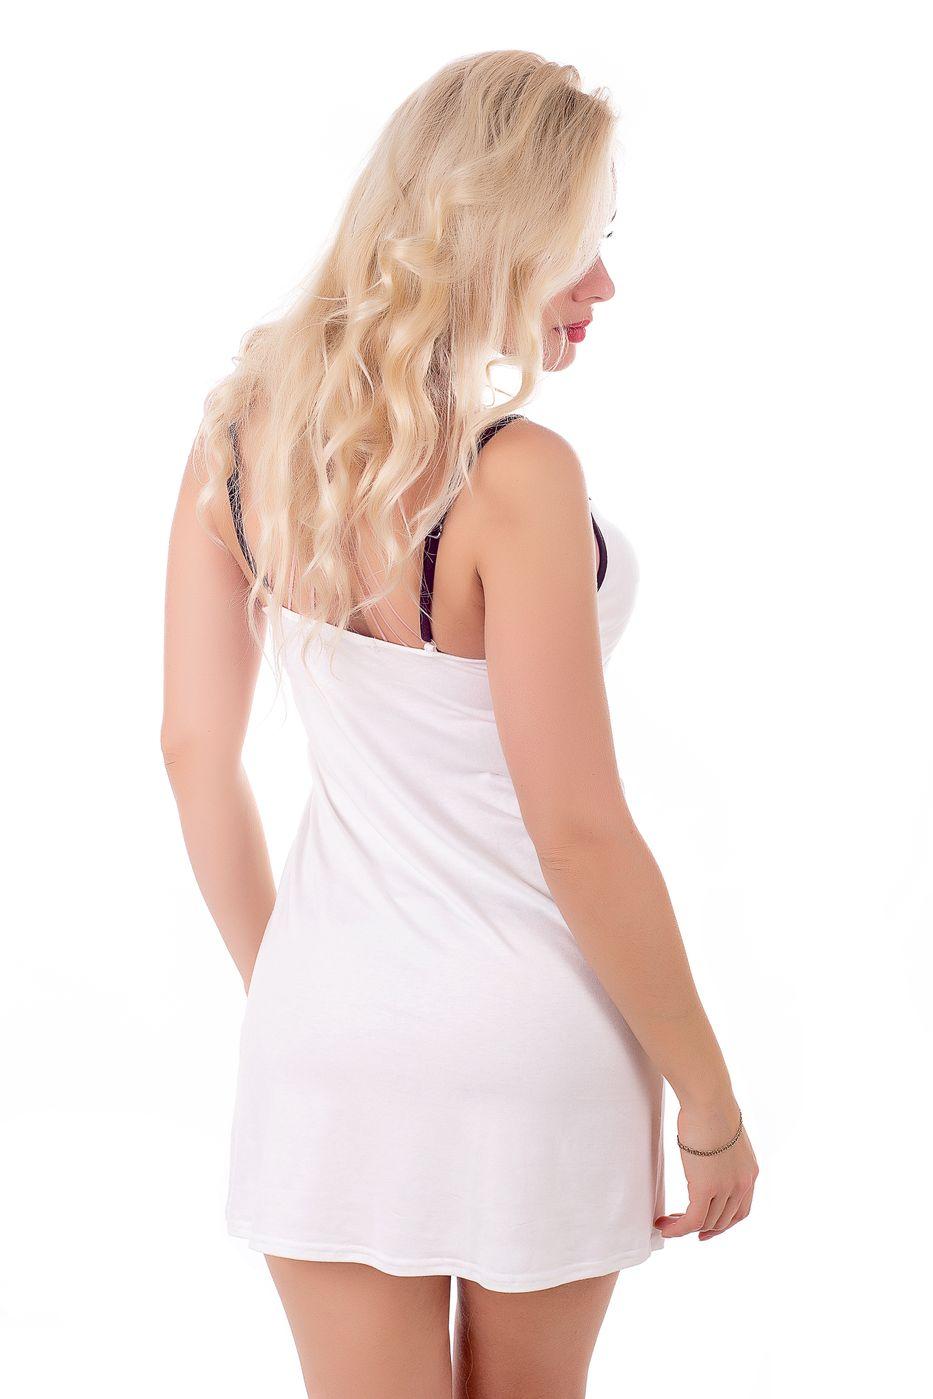 Ночная рубашка MiaNaGreen Н109х Молочный+коричневый - фото 3